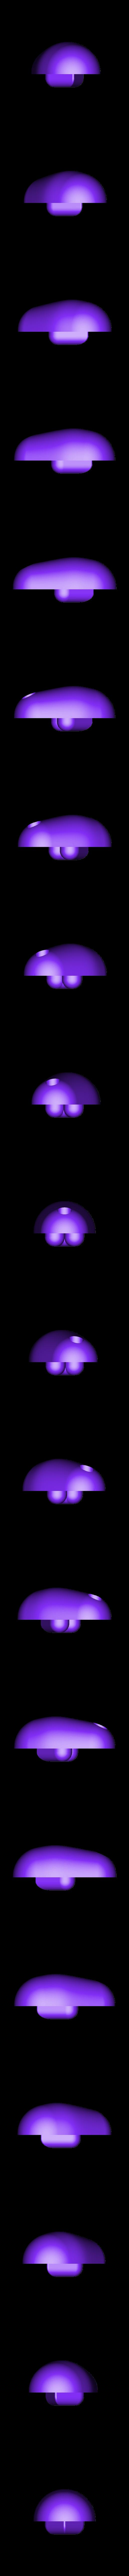 avocat_v10_single.stl Download free STL file avocado earring • Design to 3D print, chassotce